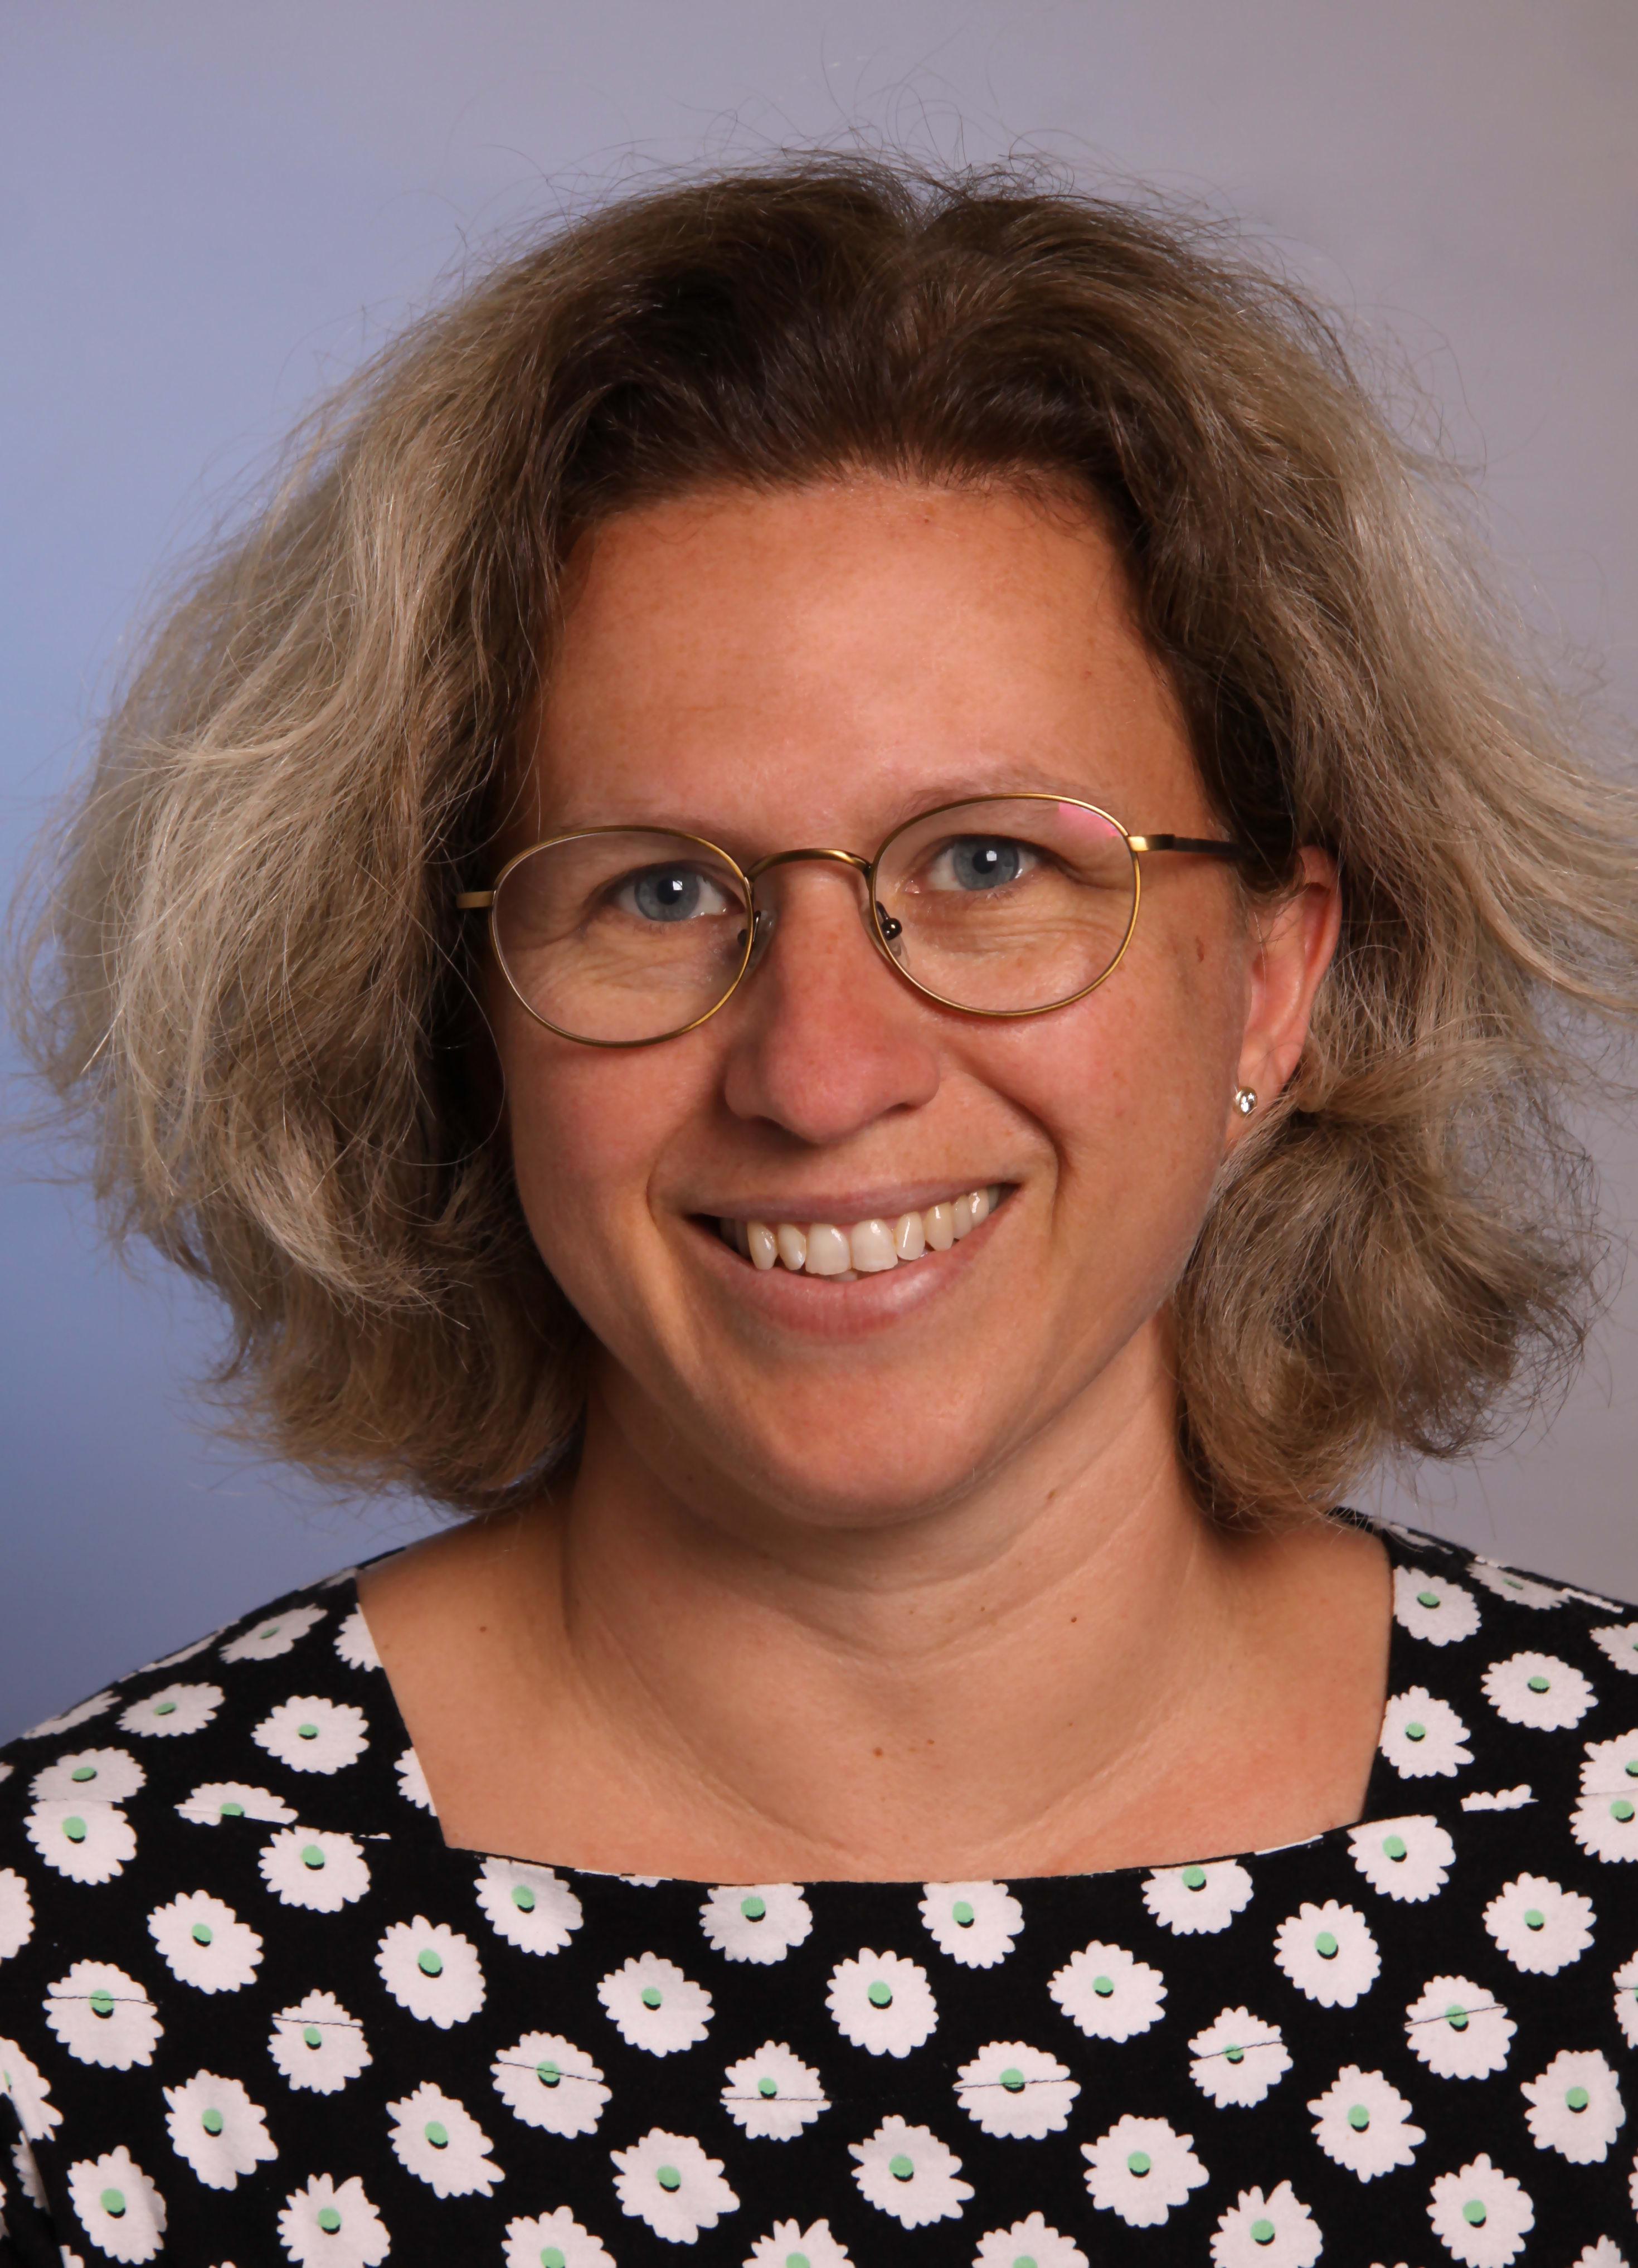 Sara Bosio Projektleiterin Themenlabor